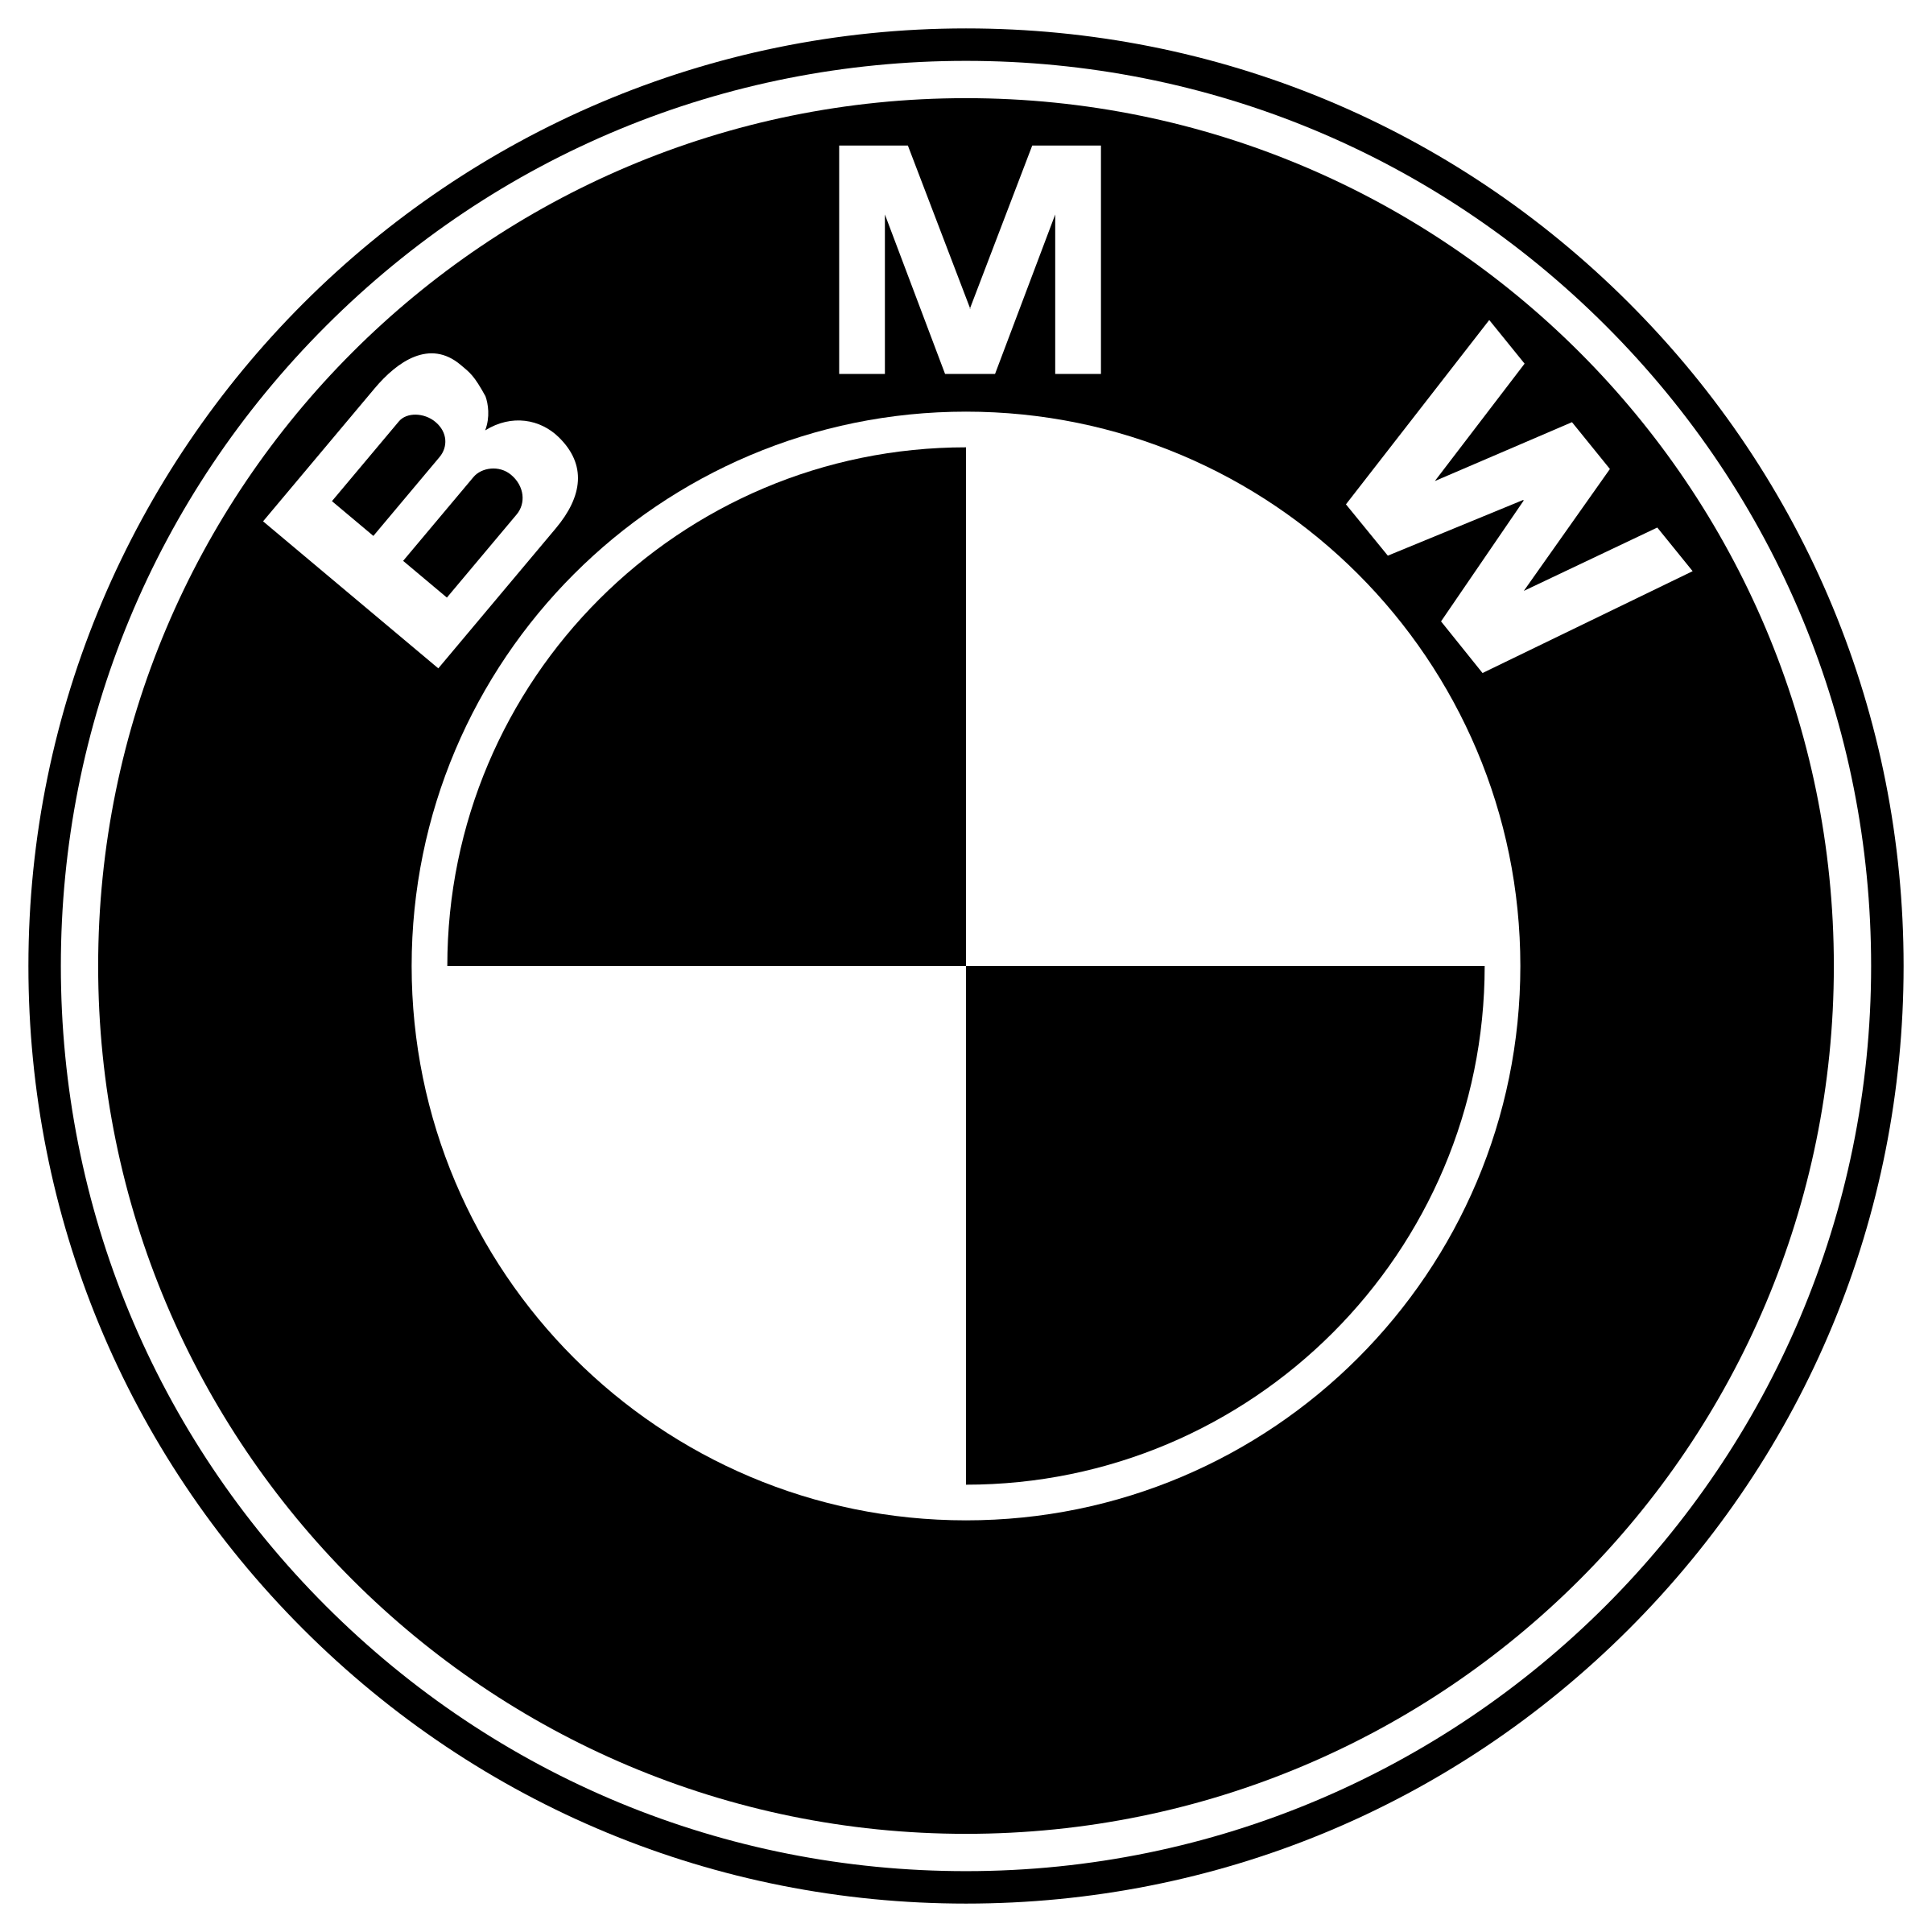 BMW 791 Logo PNG Transparent & SVG Vector - Freebie Supply